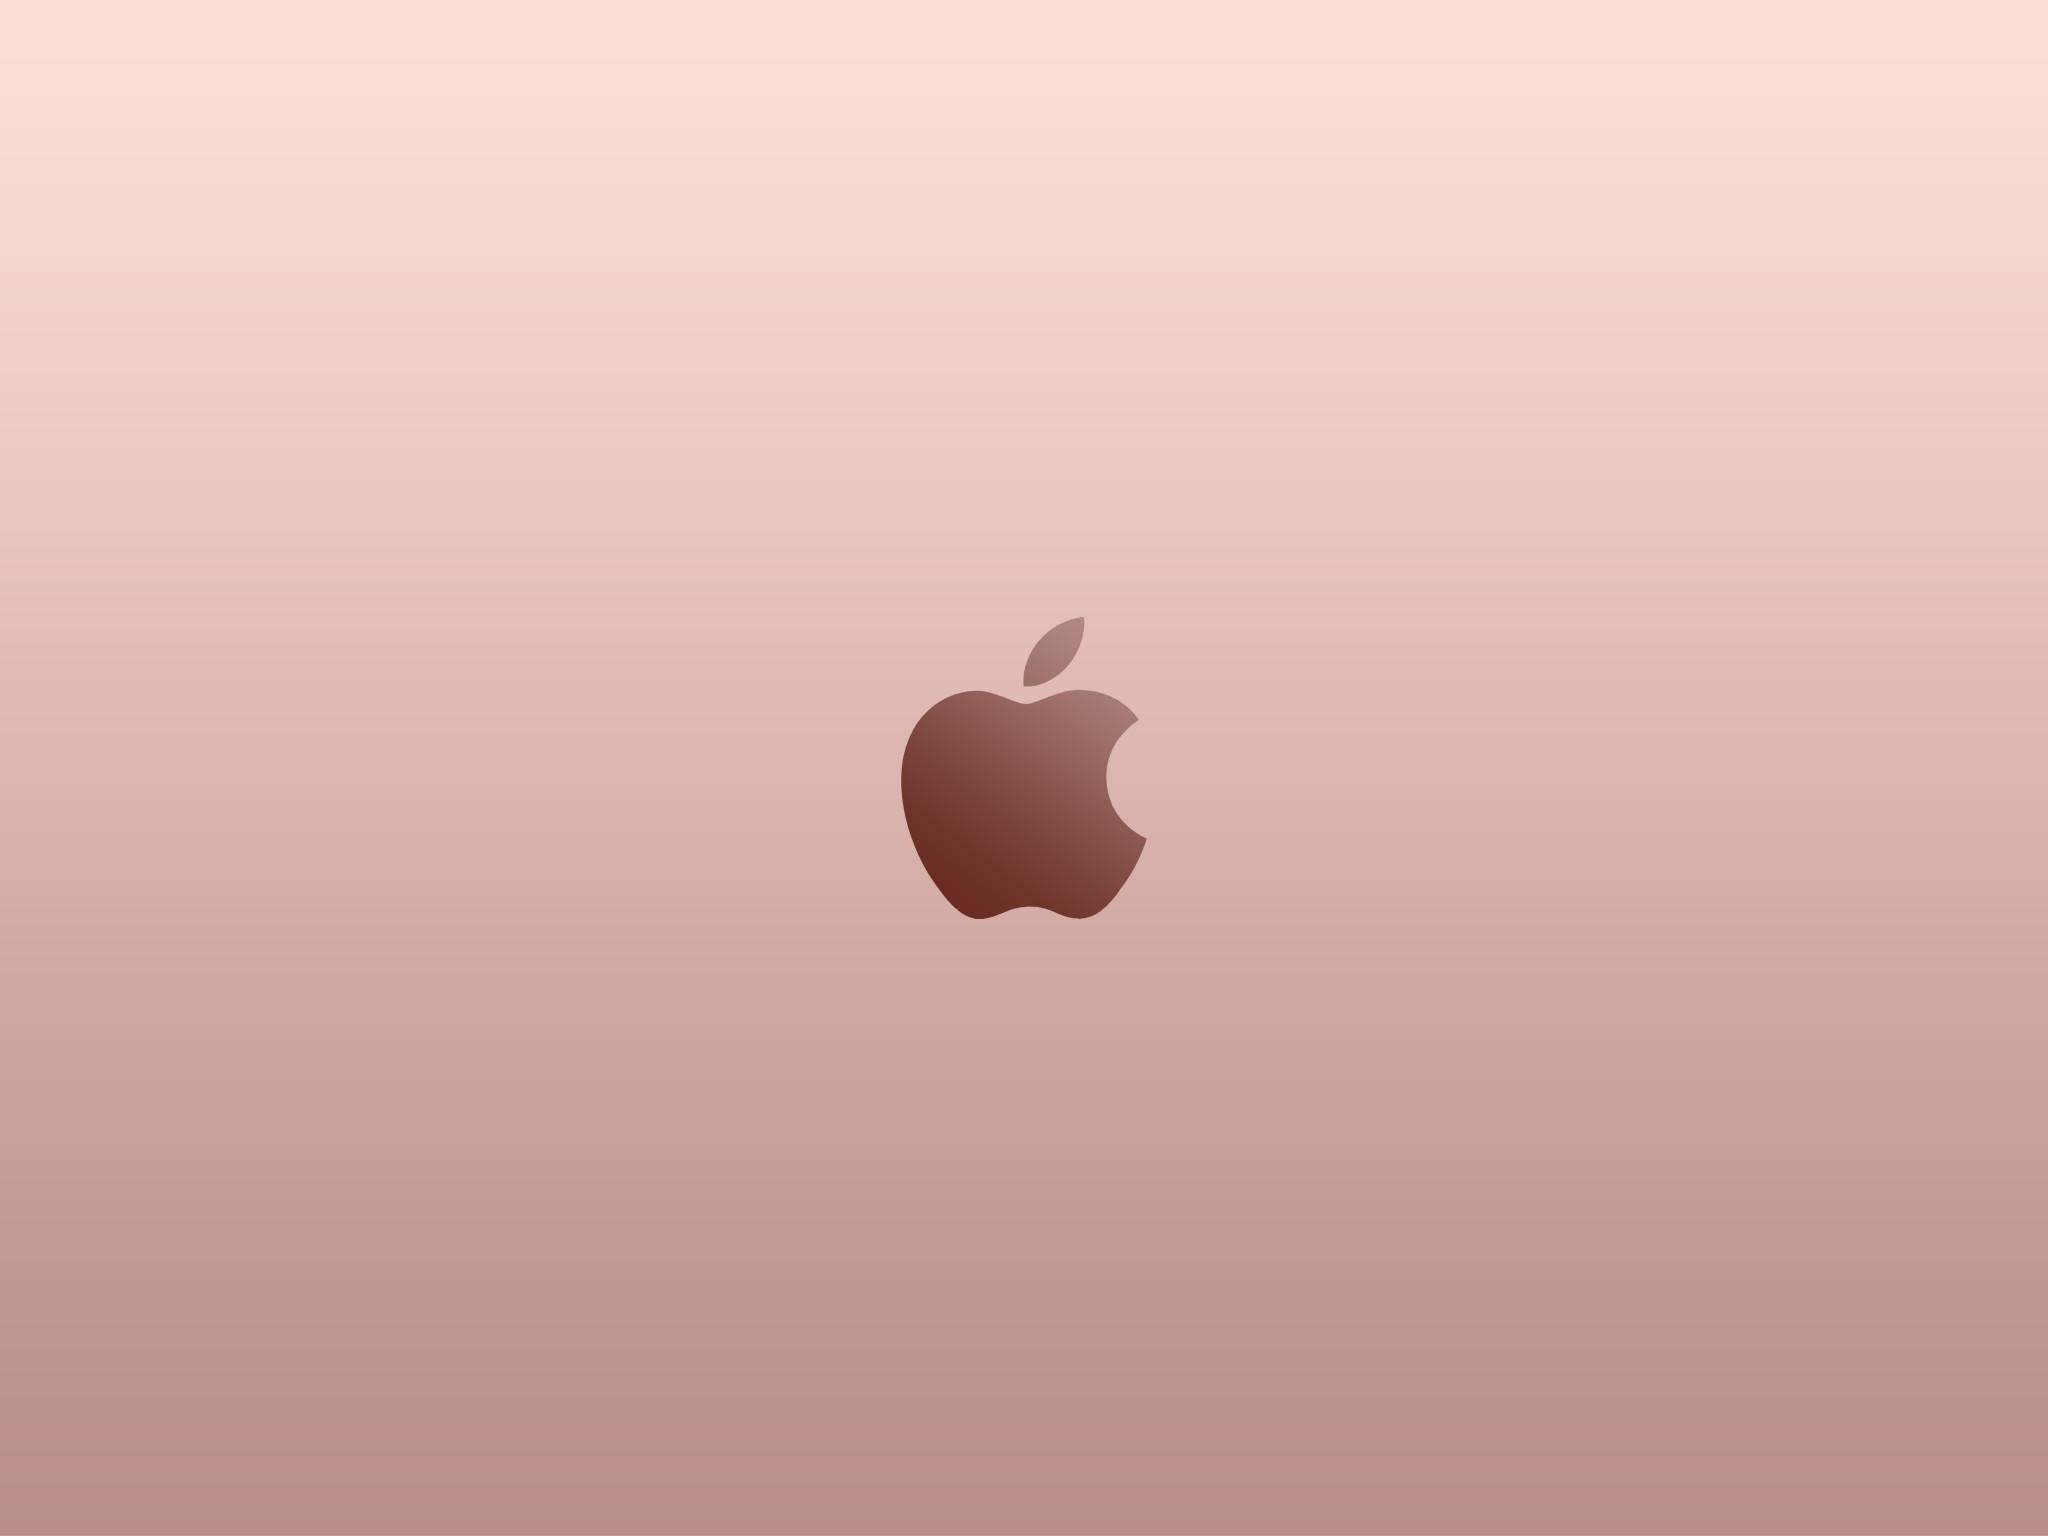 … Apple Logo Rose Gold Wallpaper by superquanganh